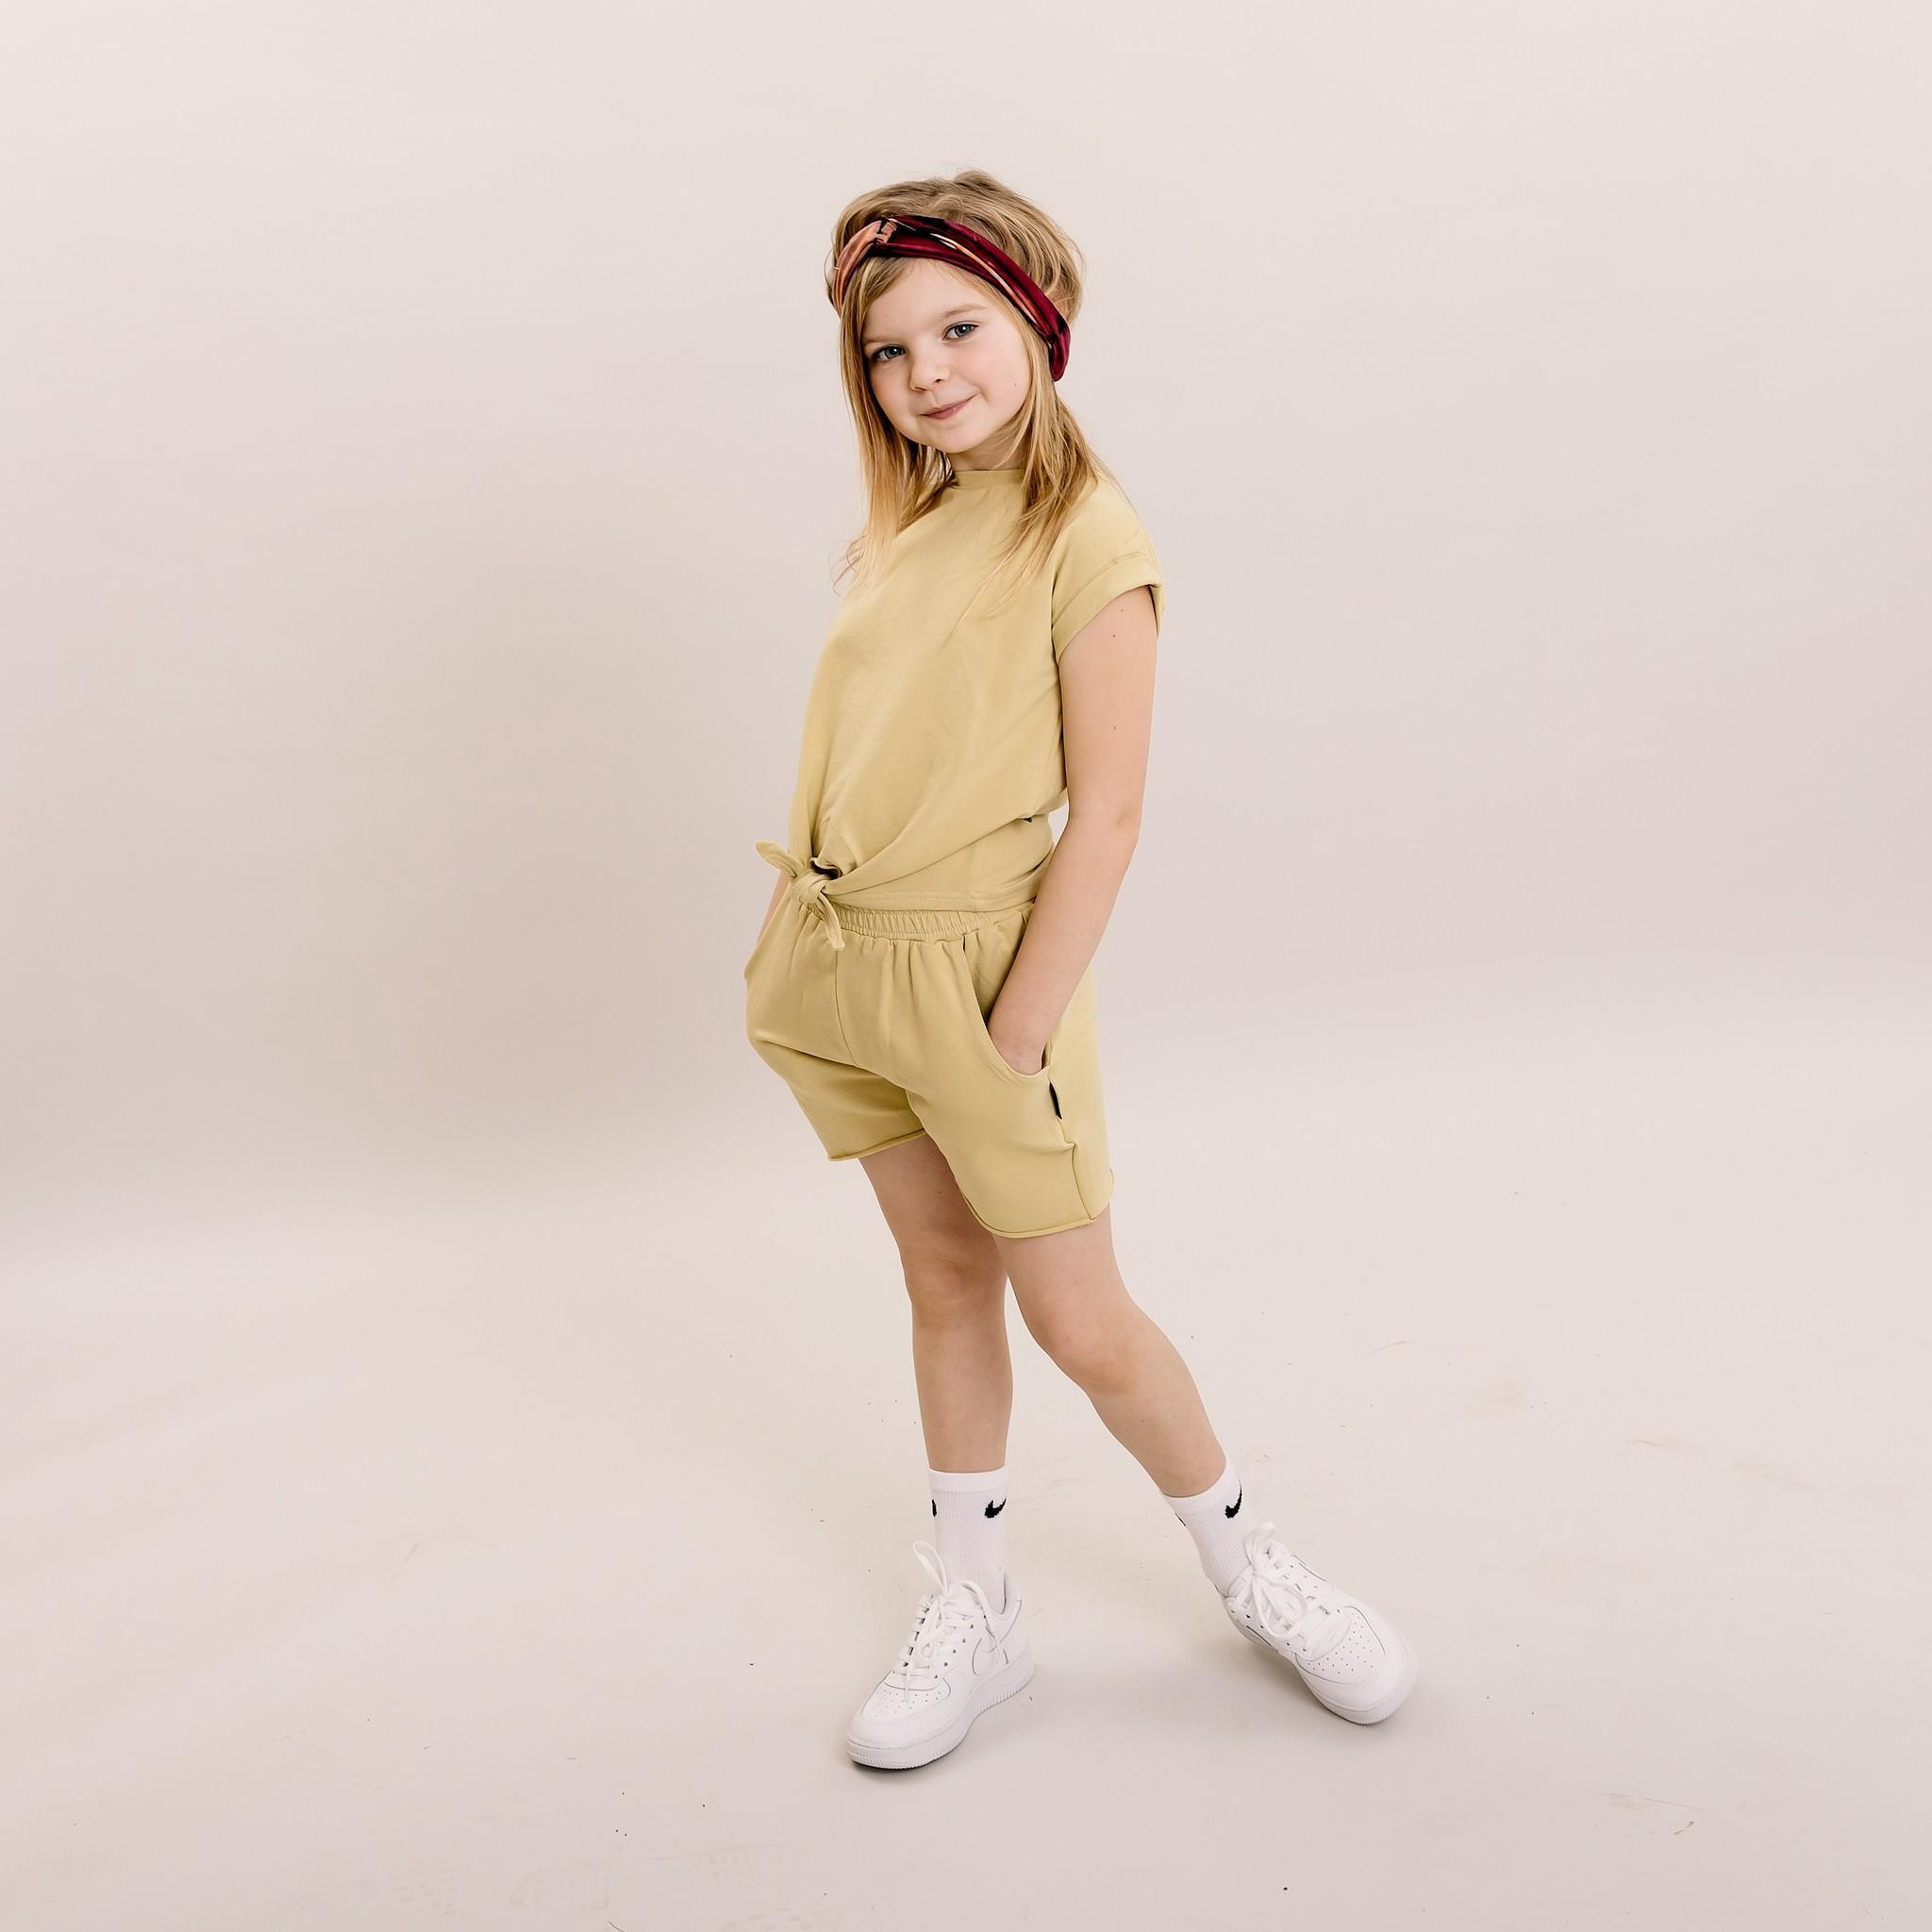 No Labels Kidswear YELLOW BERMUD | SHORT PANTS YELLOW | CHILDREN'S CLOTHES